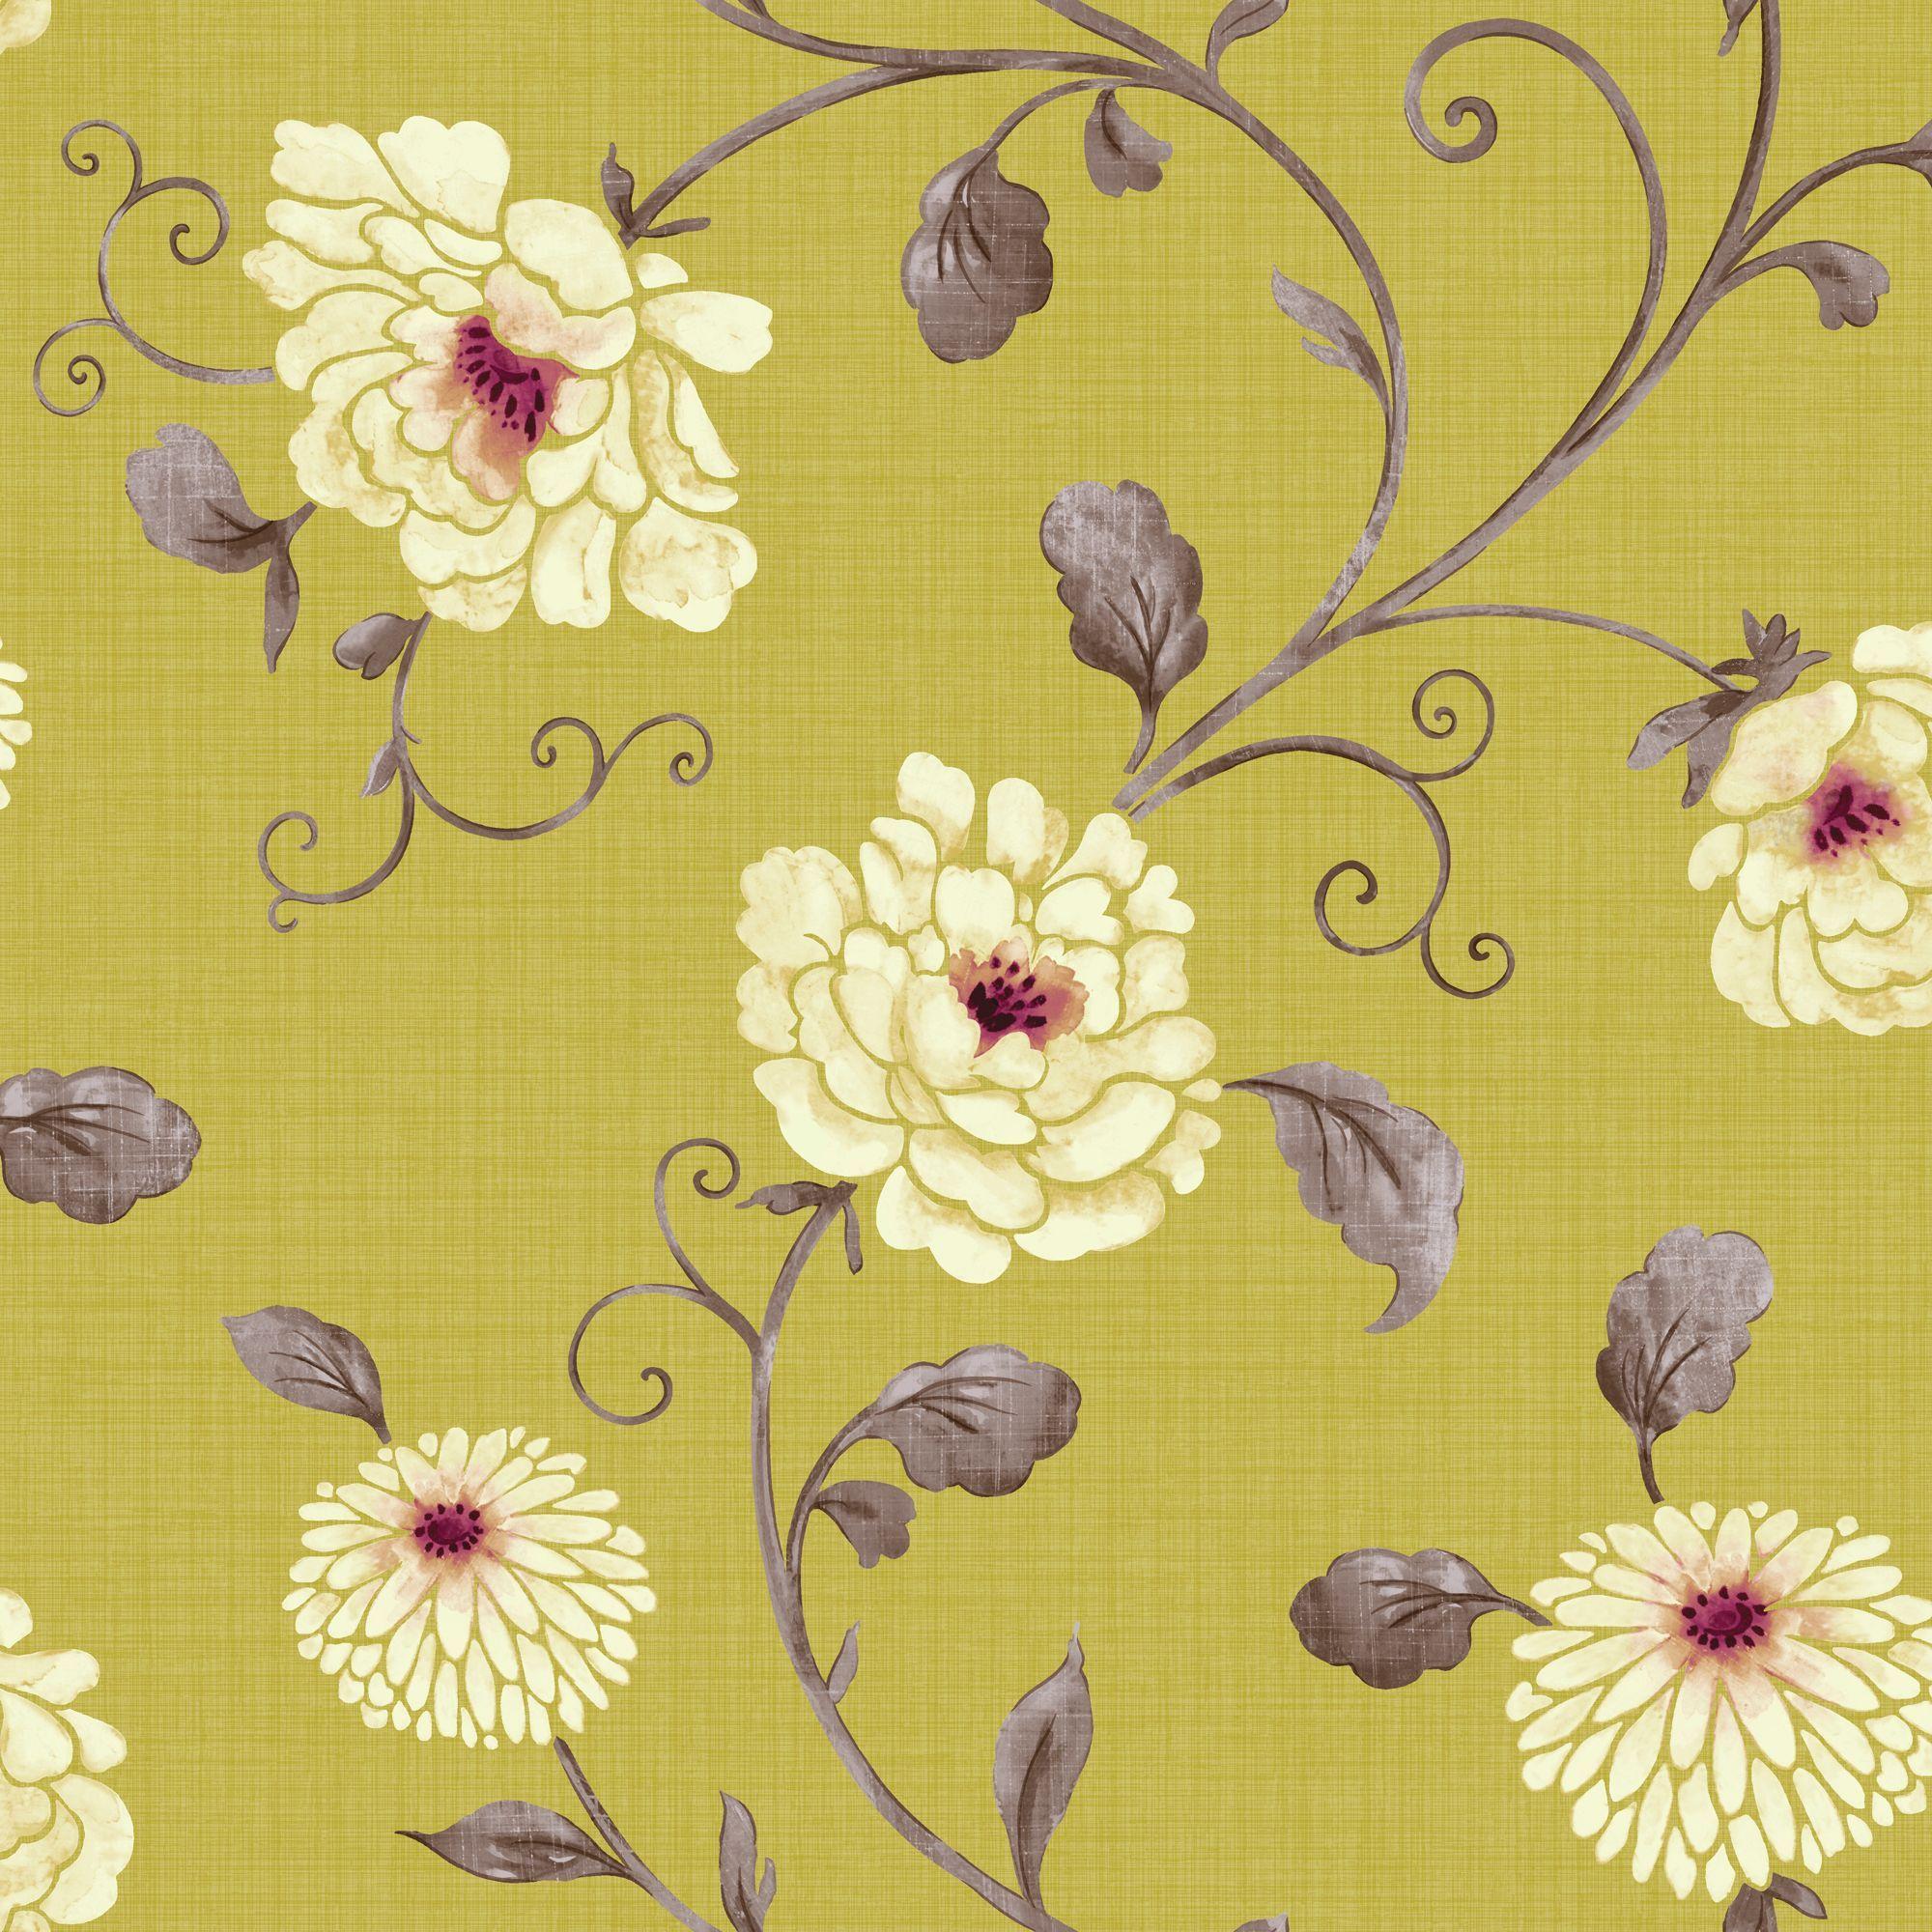 Home diy wallpaper illustration arthouse imagine fern plum motif vinyl - Arthouse Vintage Antoinette Pistachio Wallpaper Departments Diy At B Q